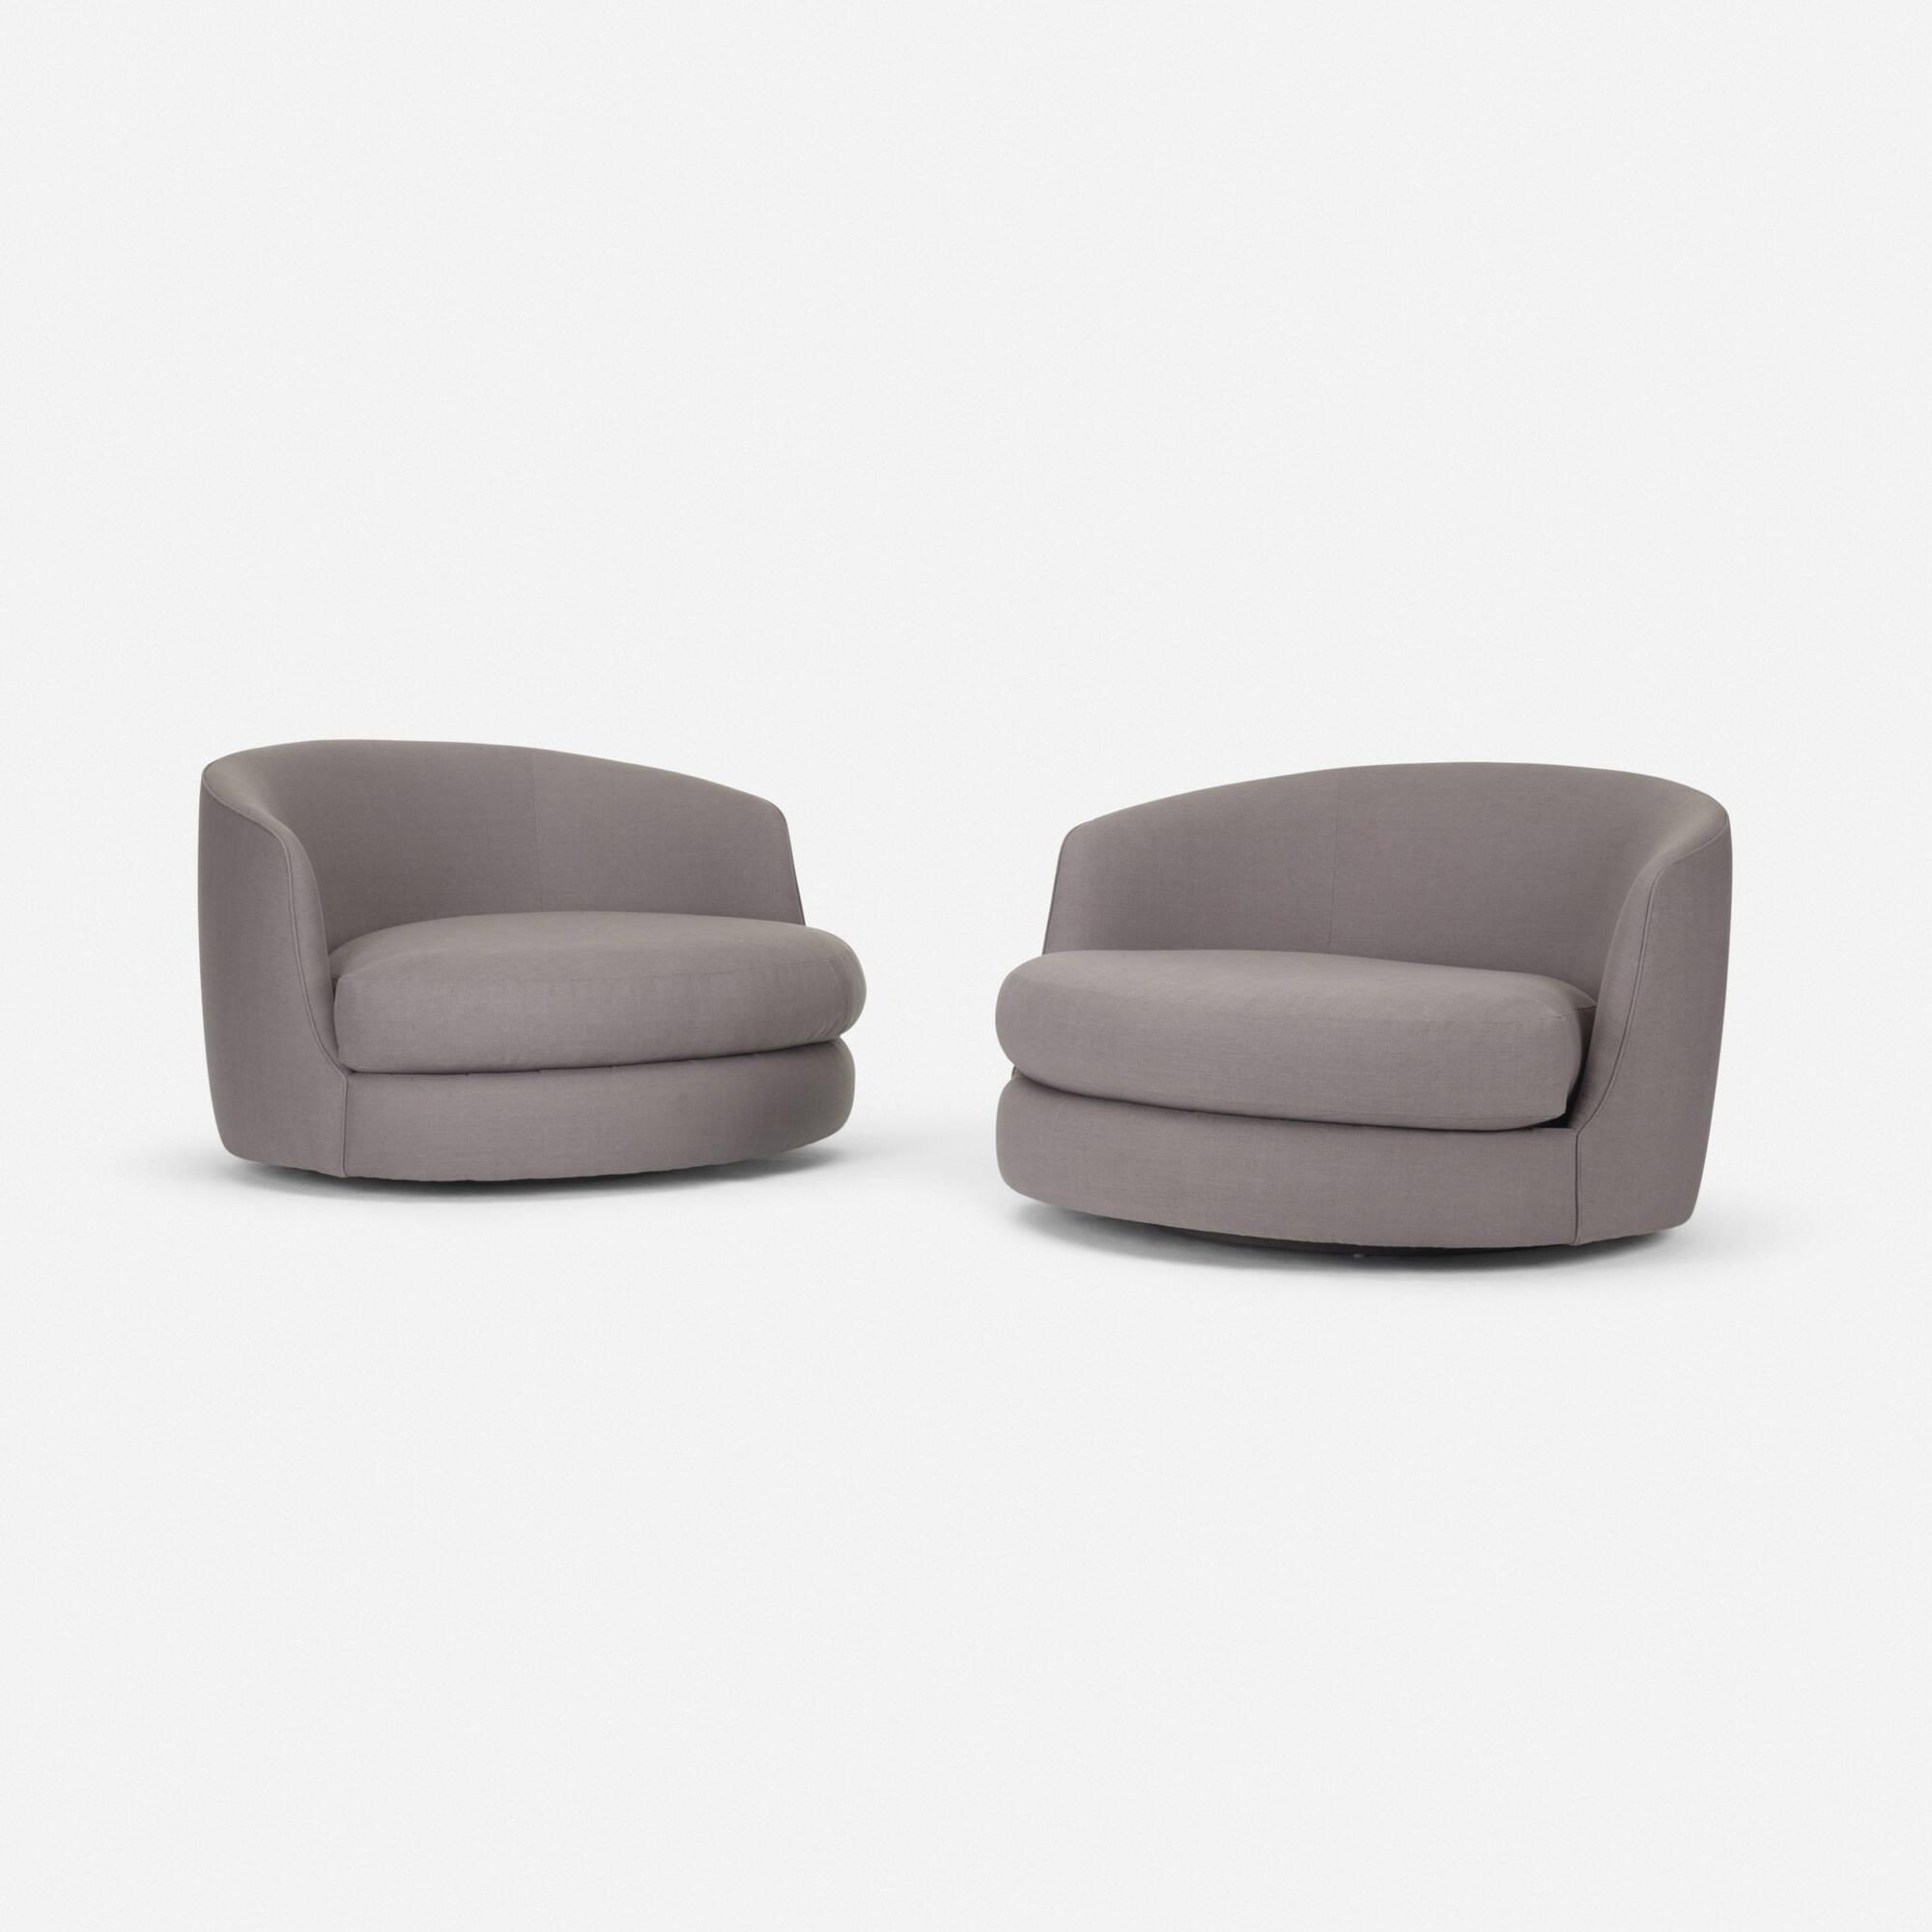 ... 149: Milo Baughman / Swivel Lounge Chairs, Pair (2 Of 2)